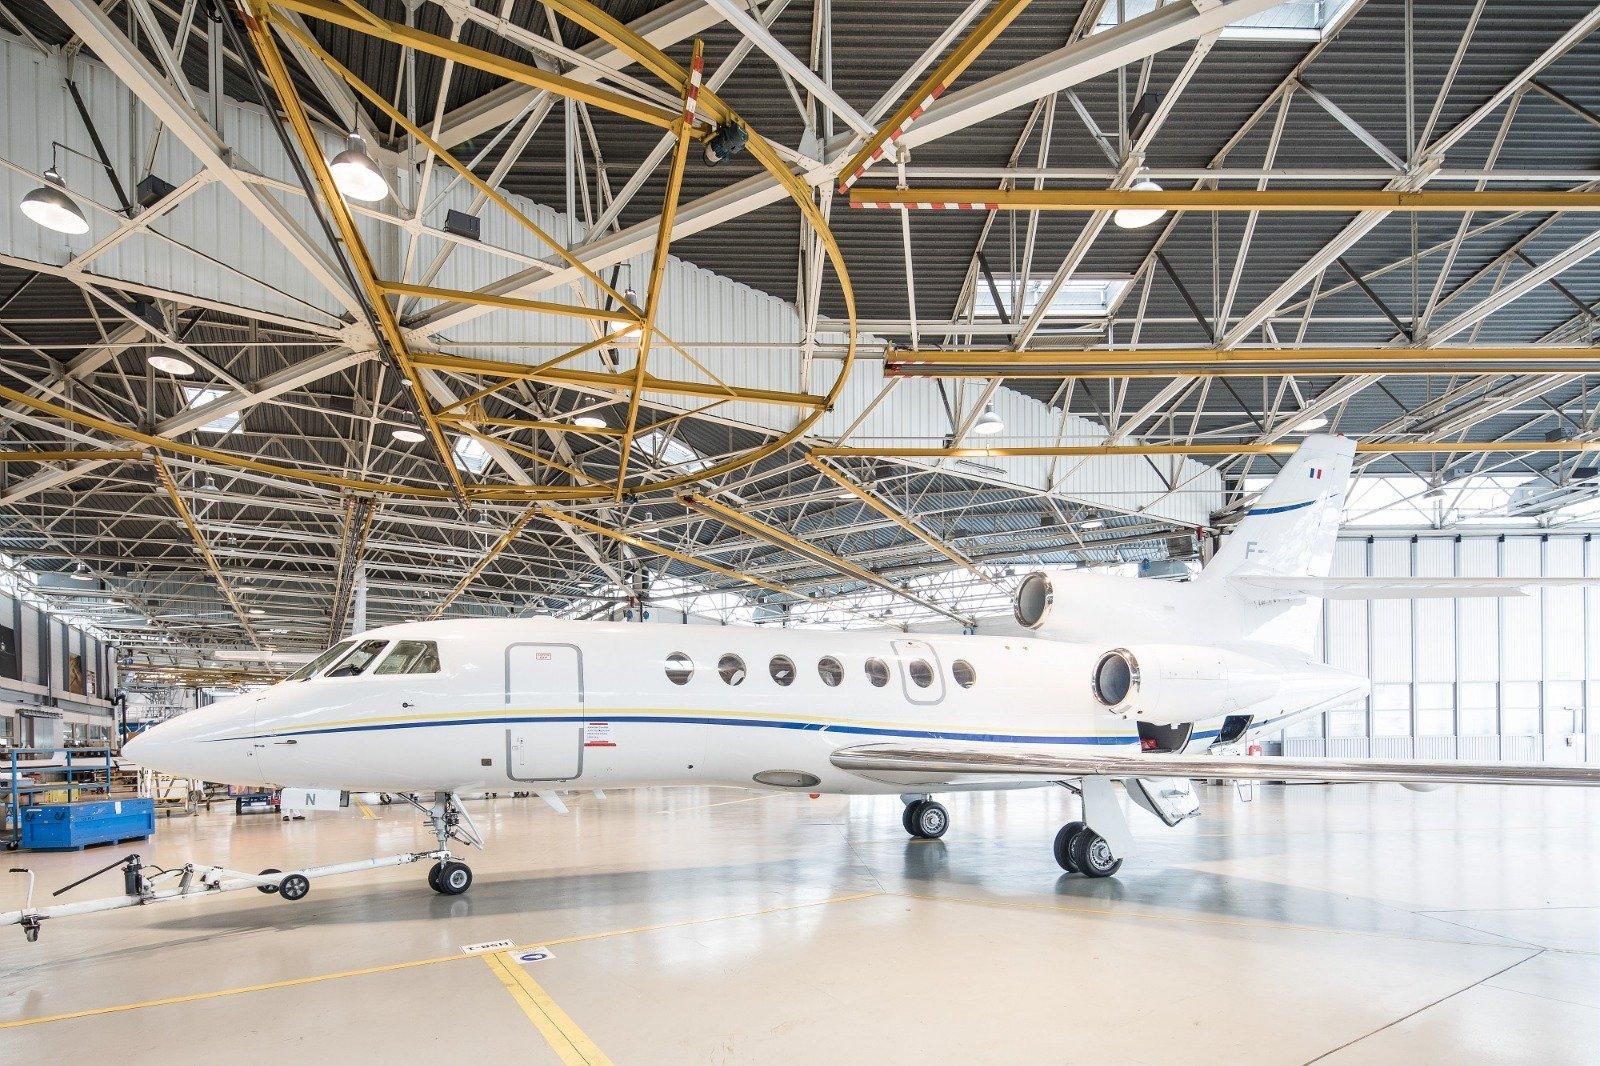 Falcon 50: origins, characteristics and performance data